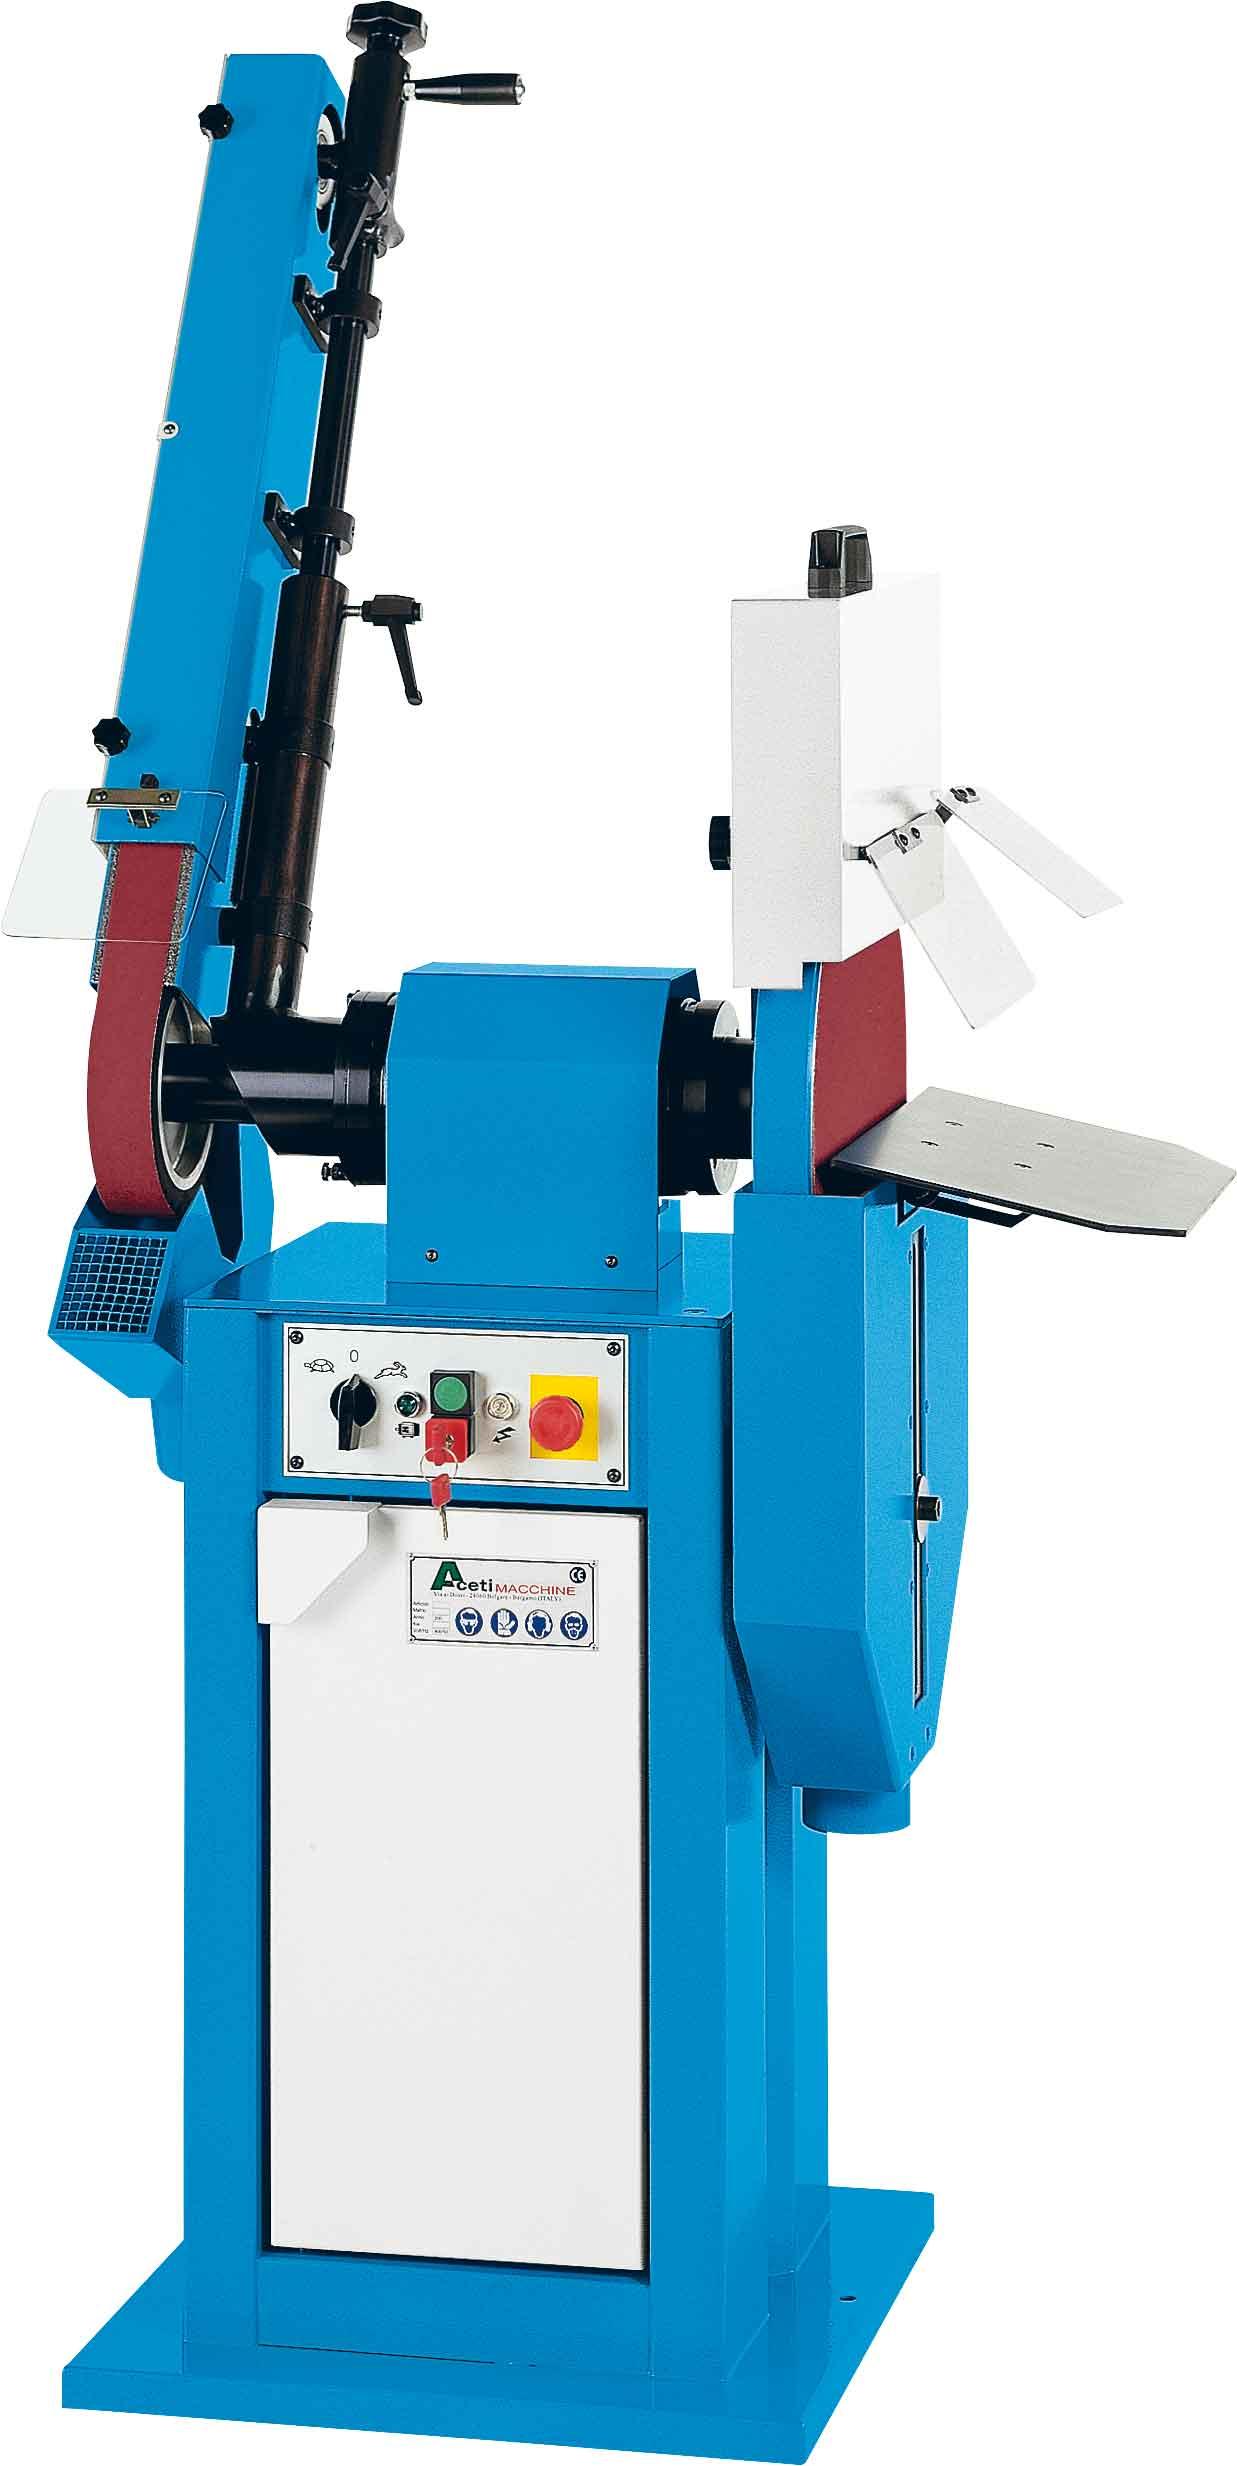 ART.30 - Belt grinding machine